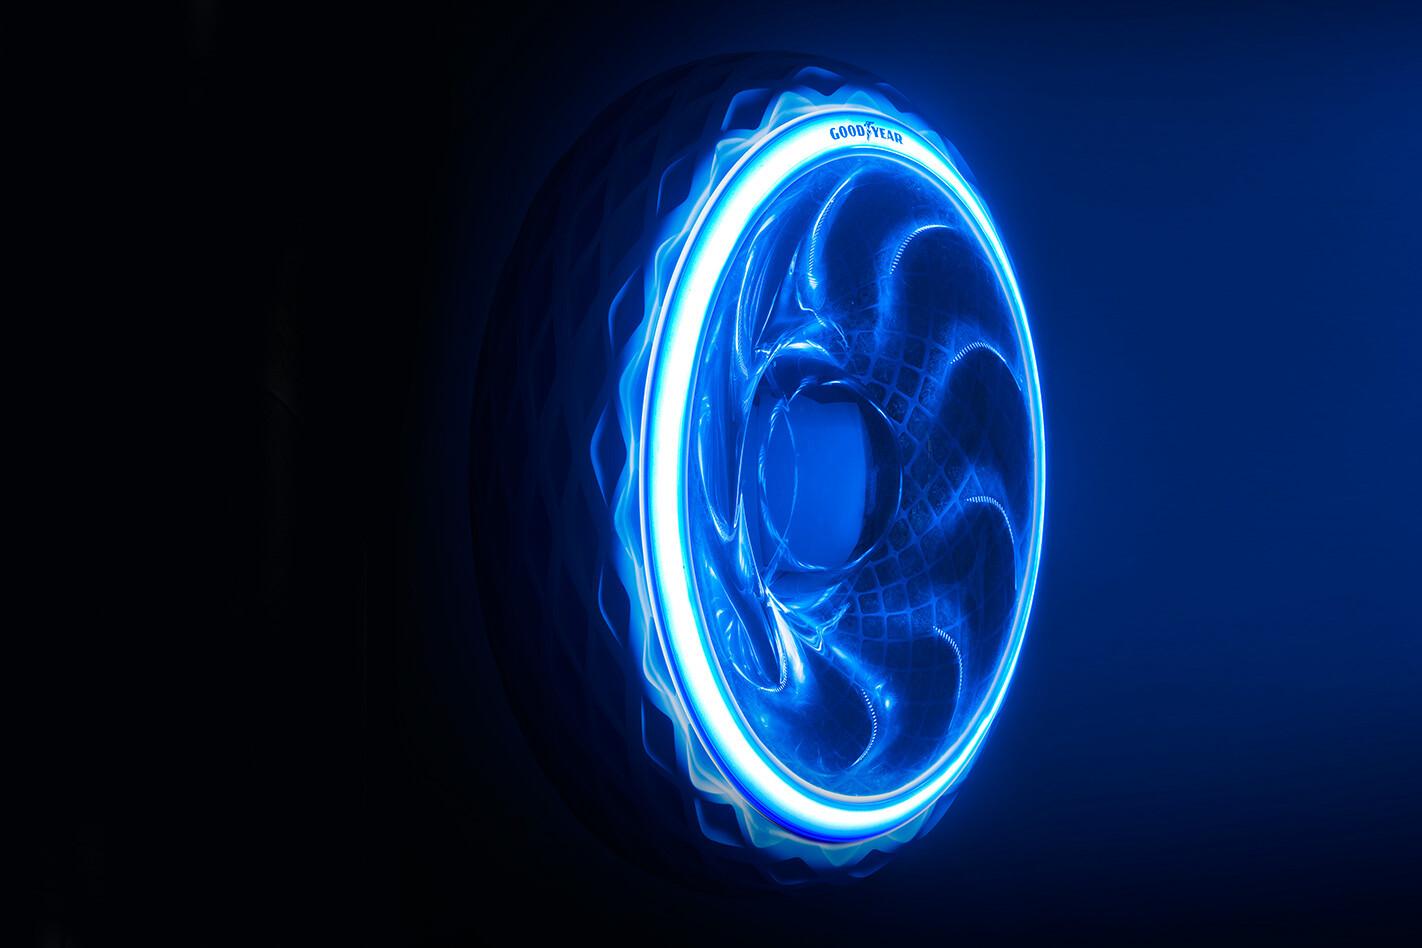 Goodyear Oxygene Tyre Glow Up Jpg